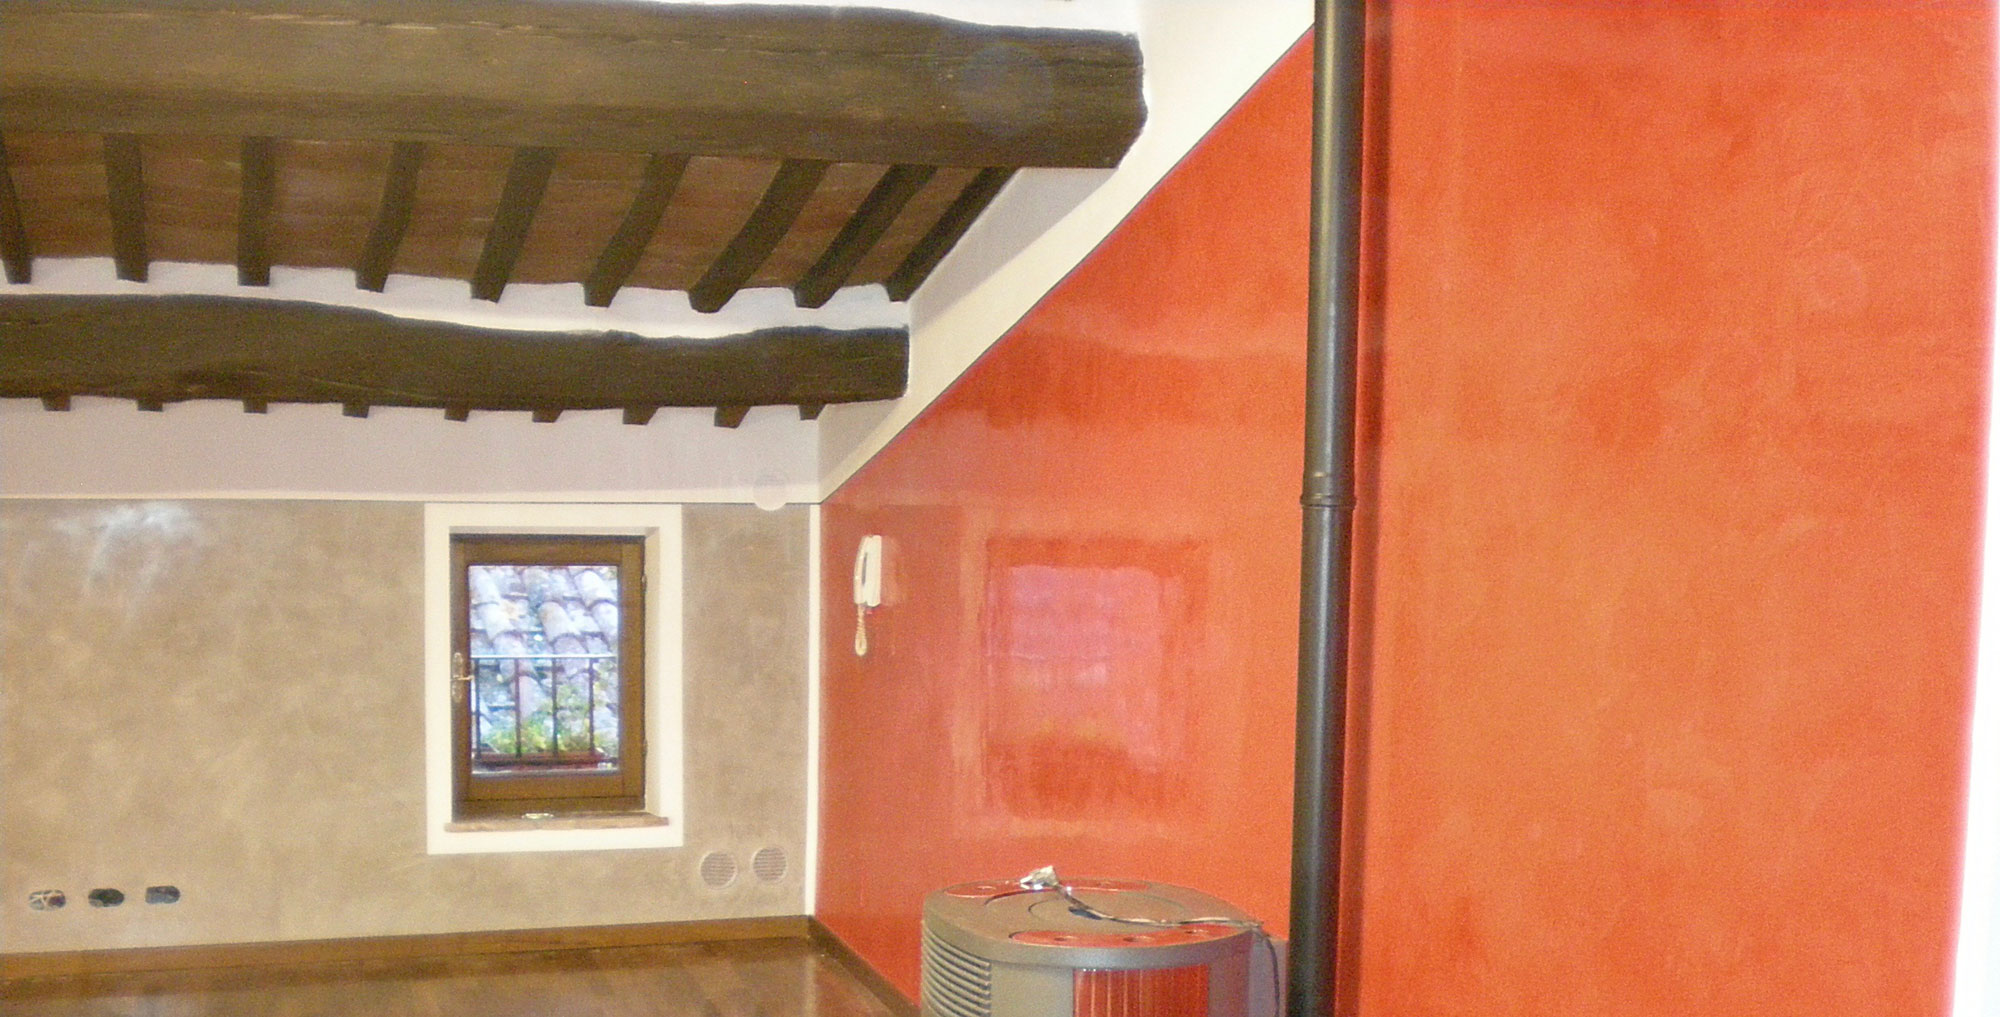 Pittura Stucco Veneziano Foto tinteggiatura interna e stucco veneziano – giacomomencarelli